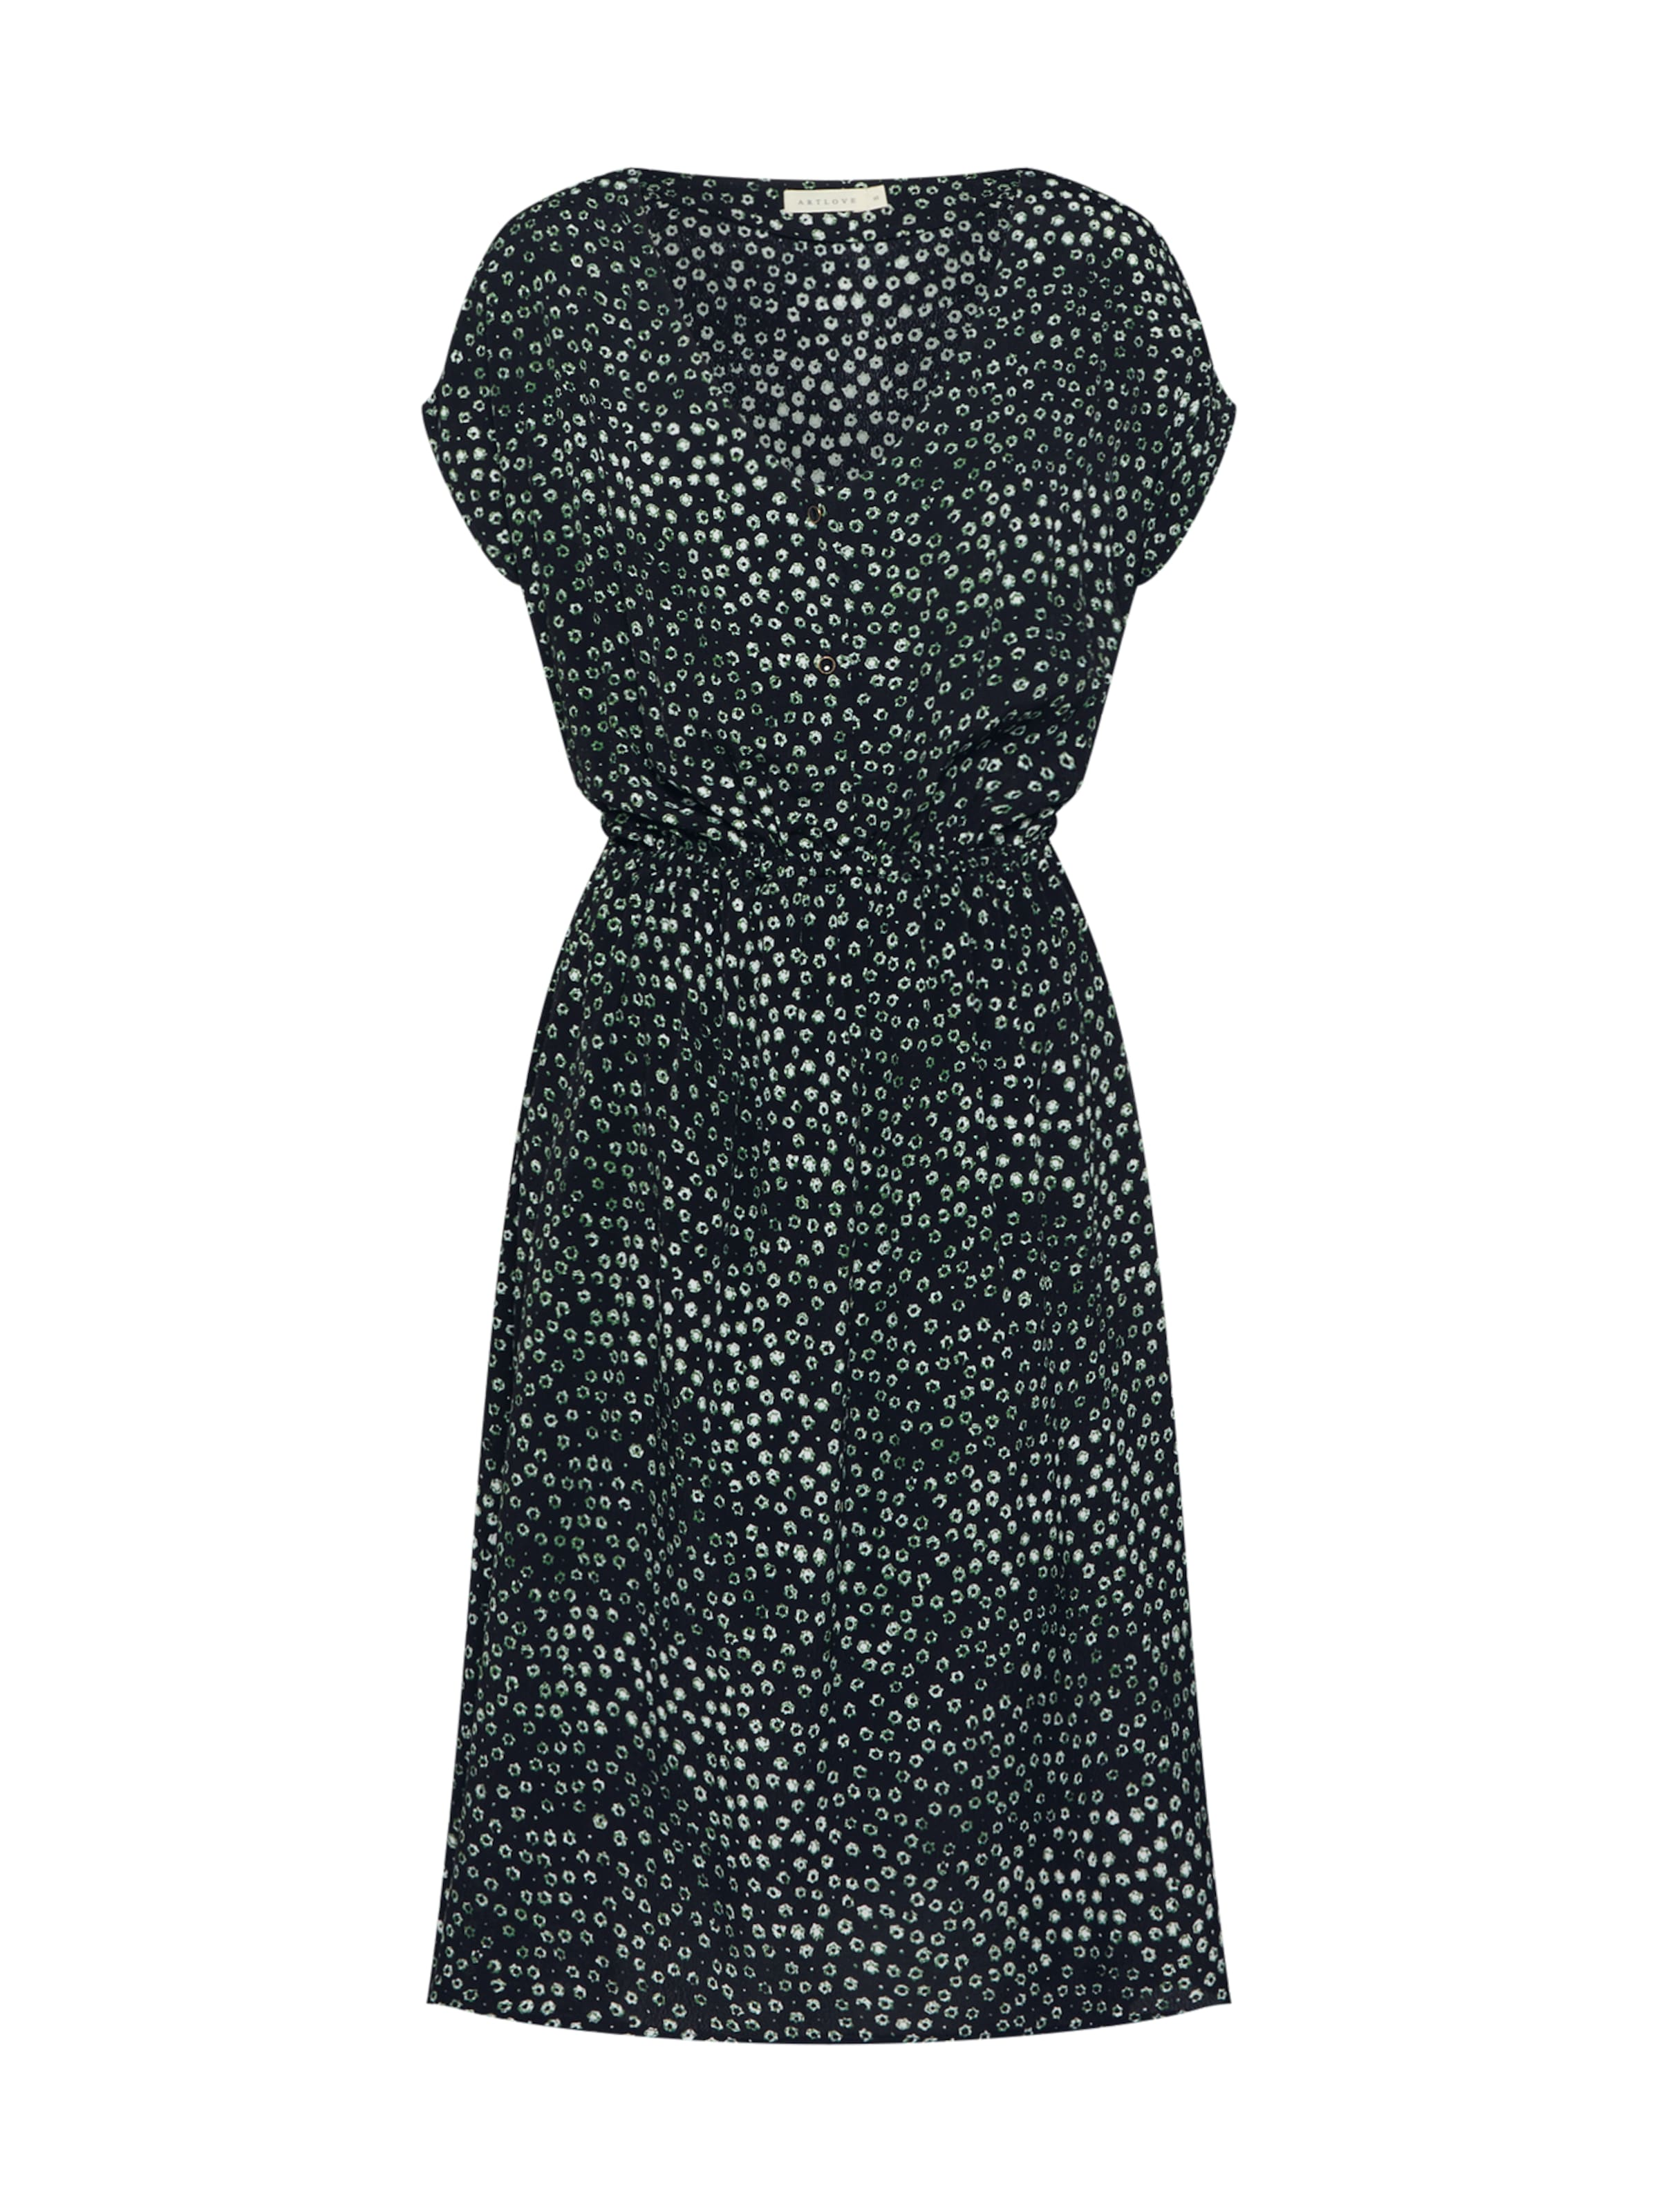 Dunkelgrün Artlove In '52122' Kleid Paris srBhQxCtd